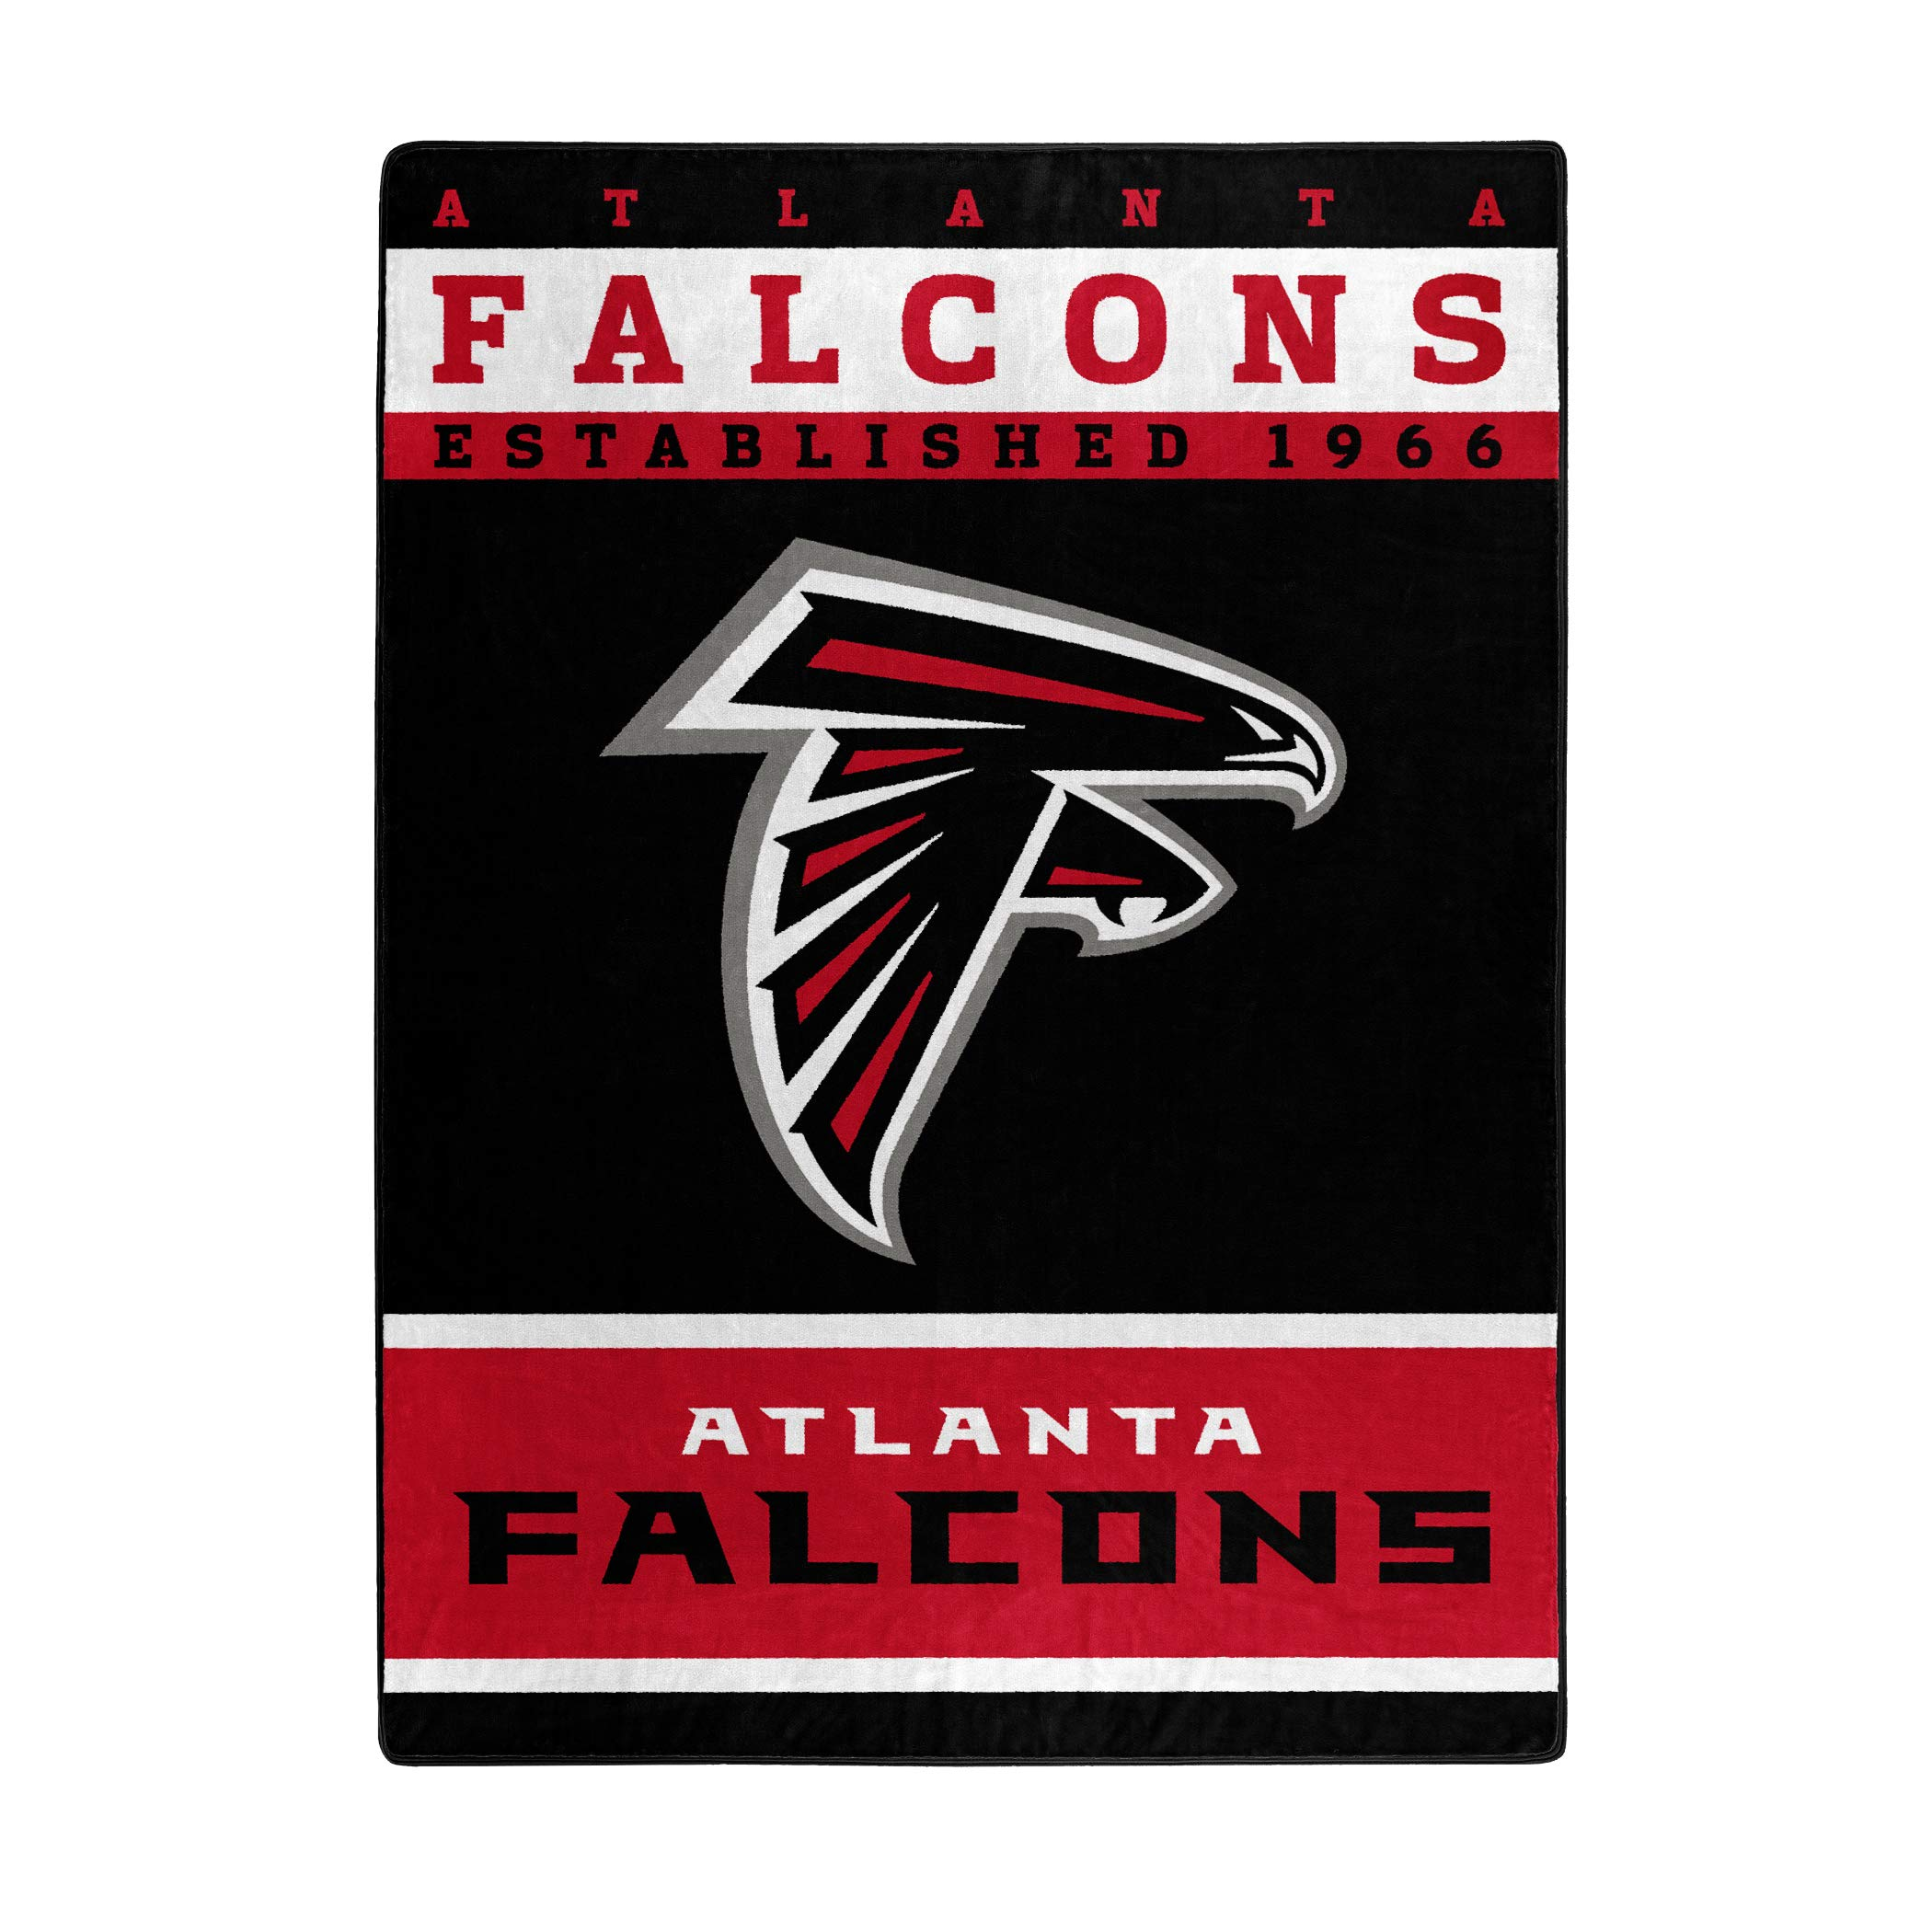 The Northwest Company Officially Licensed NFL Atlanta Falcons 12th Man Plush Raschel Throw Blanket, 60'' x 80''